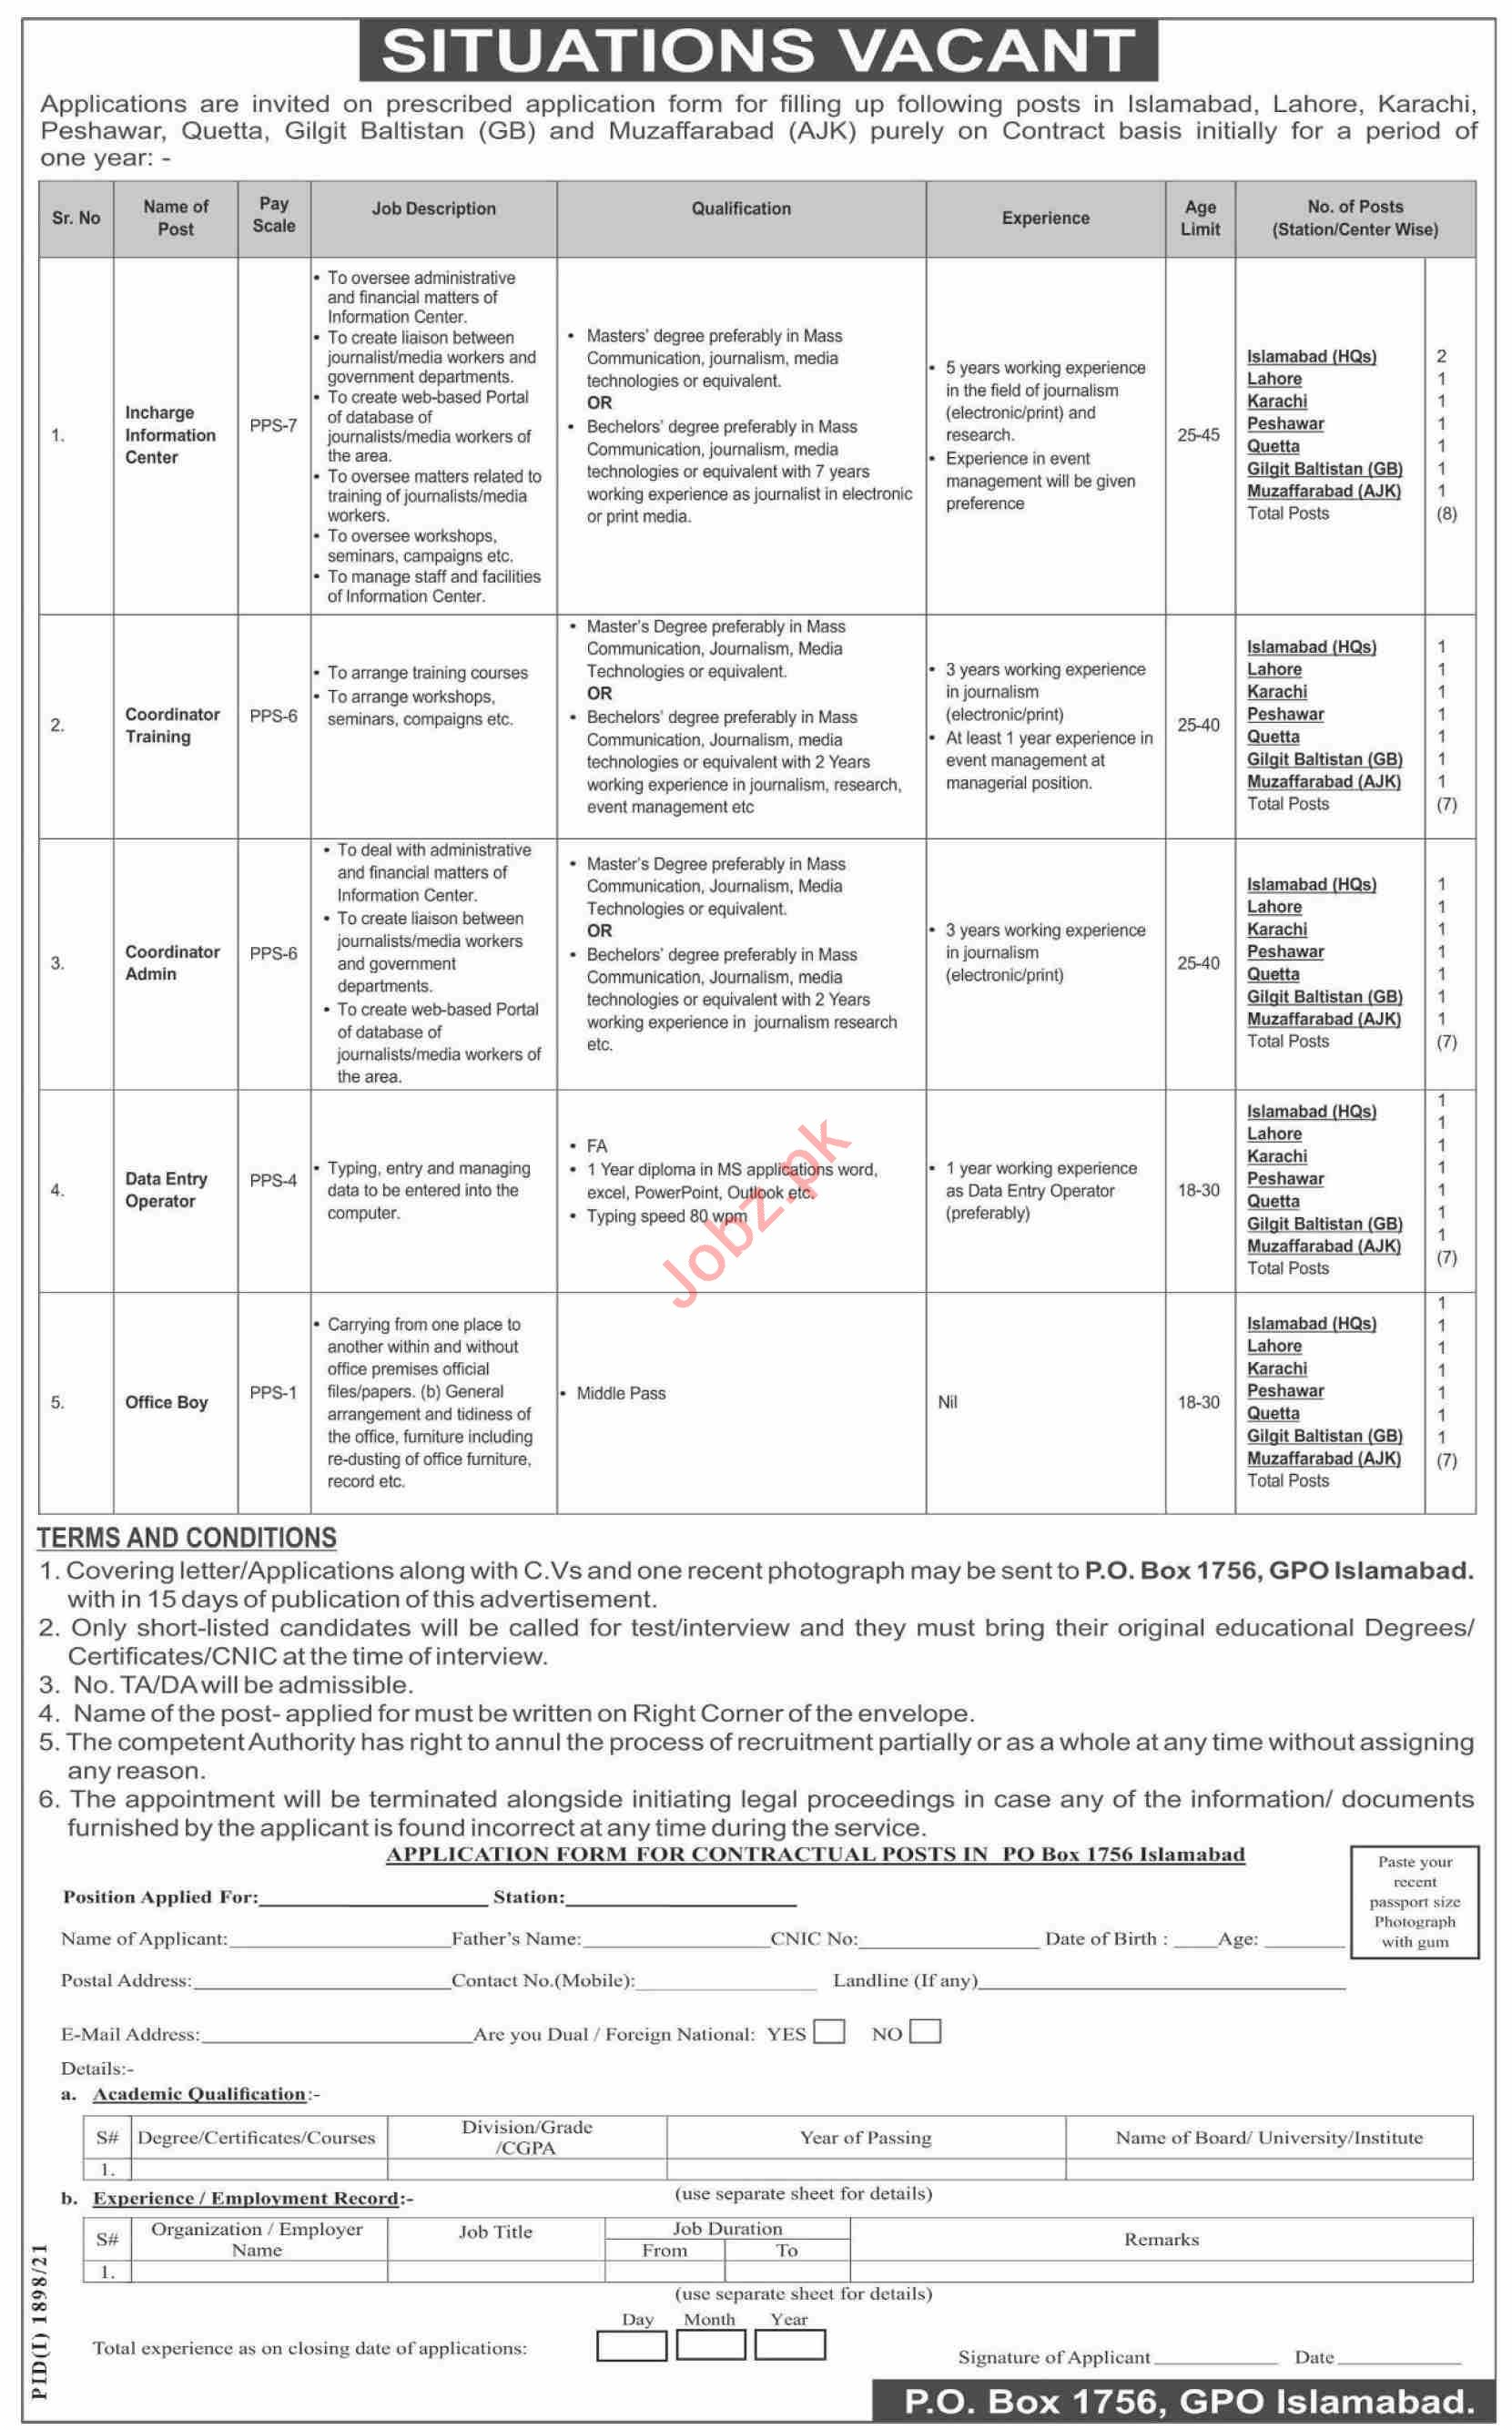 P O Box No 1756 GPO Islamabad Jobs 2021 for Coordinator